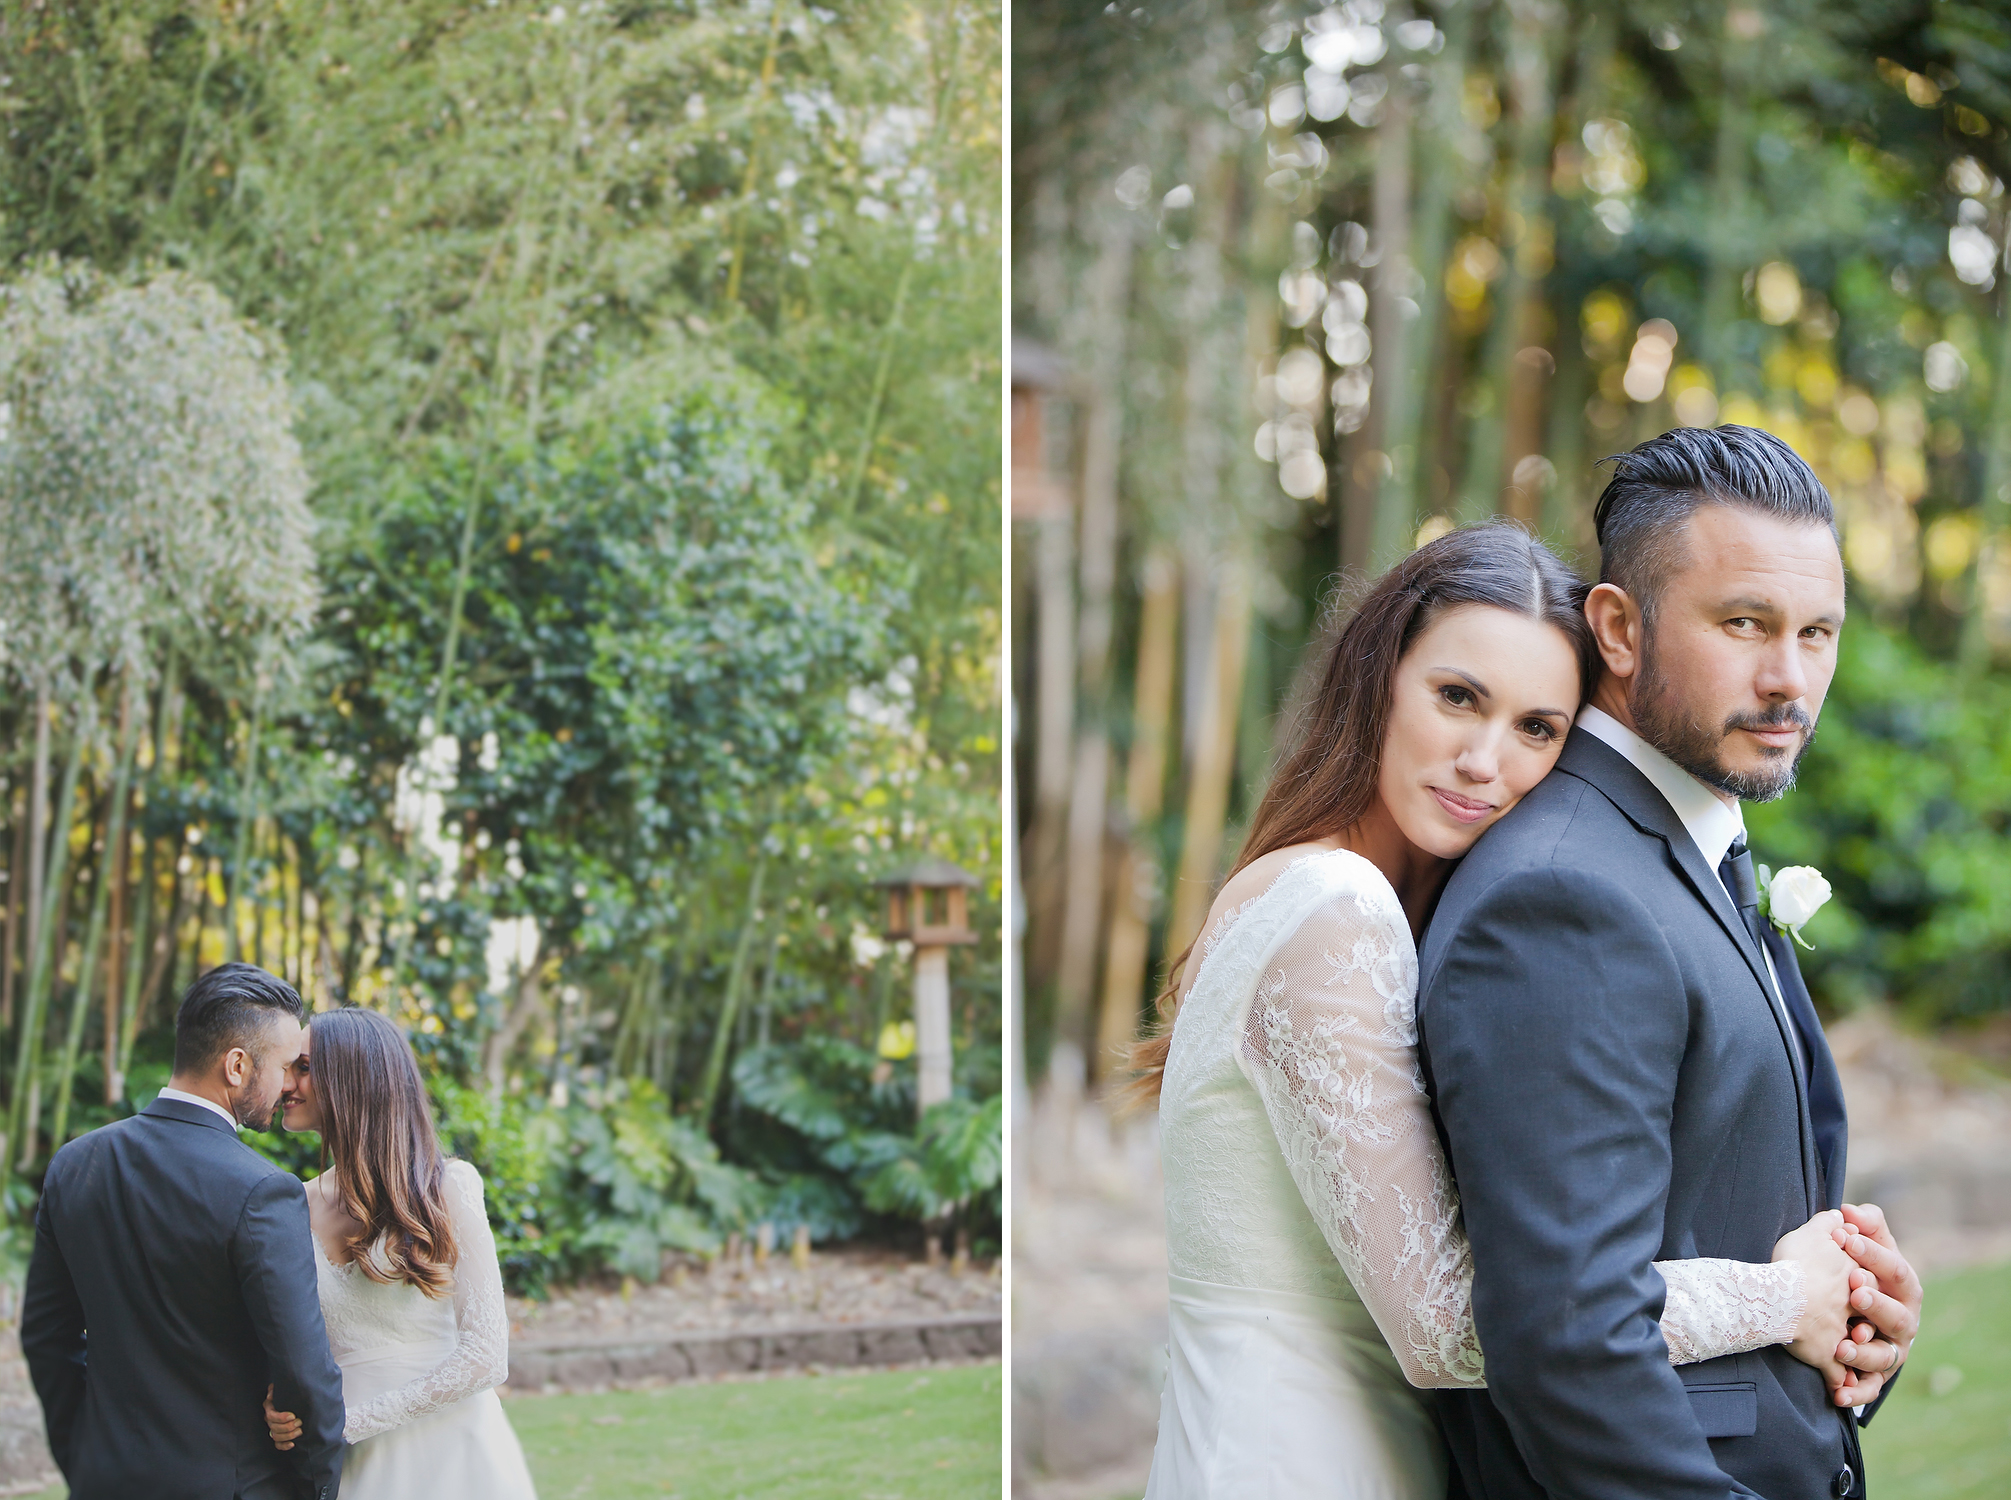 wellington wedding photography NZ - 0828.JPG